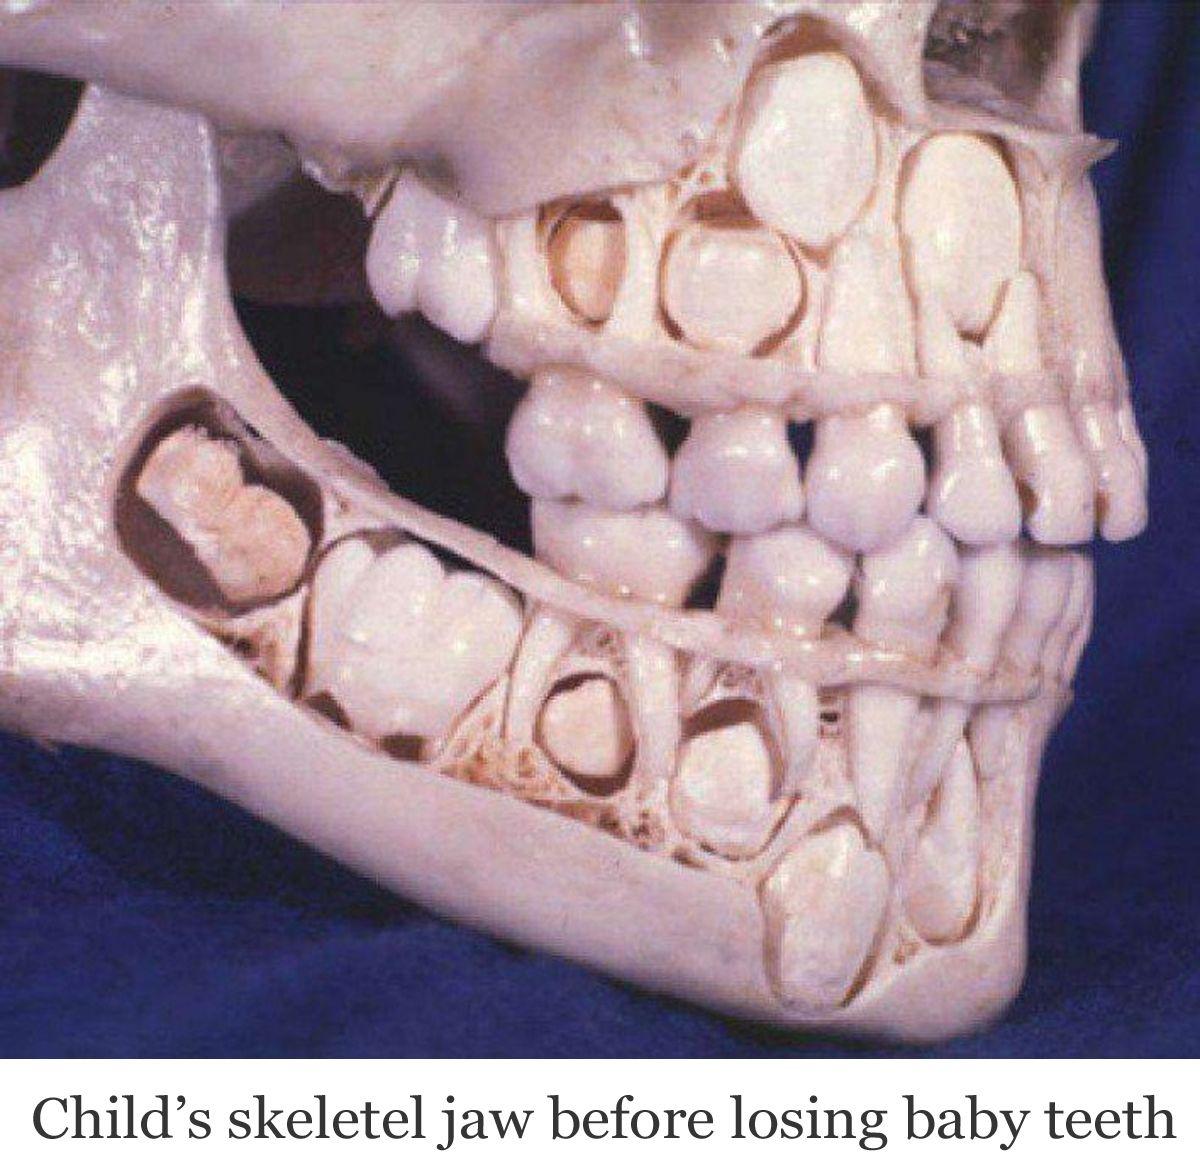 Child's jaw before losing baby teeth Zähne, Milchzähne